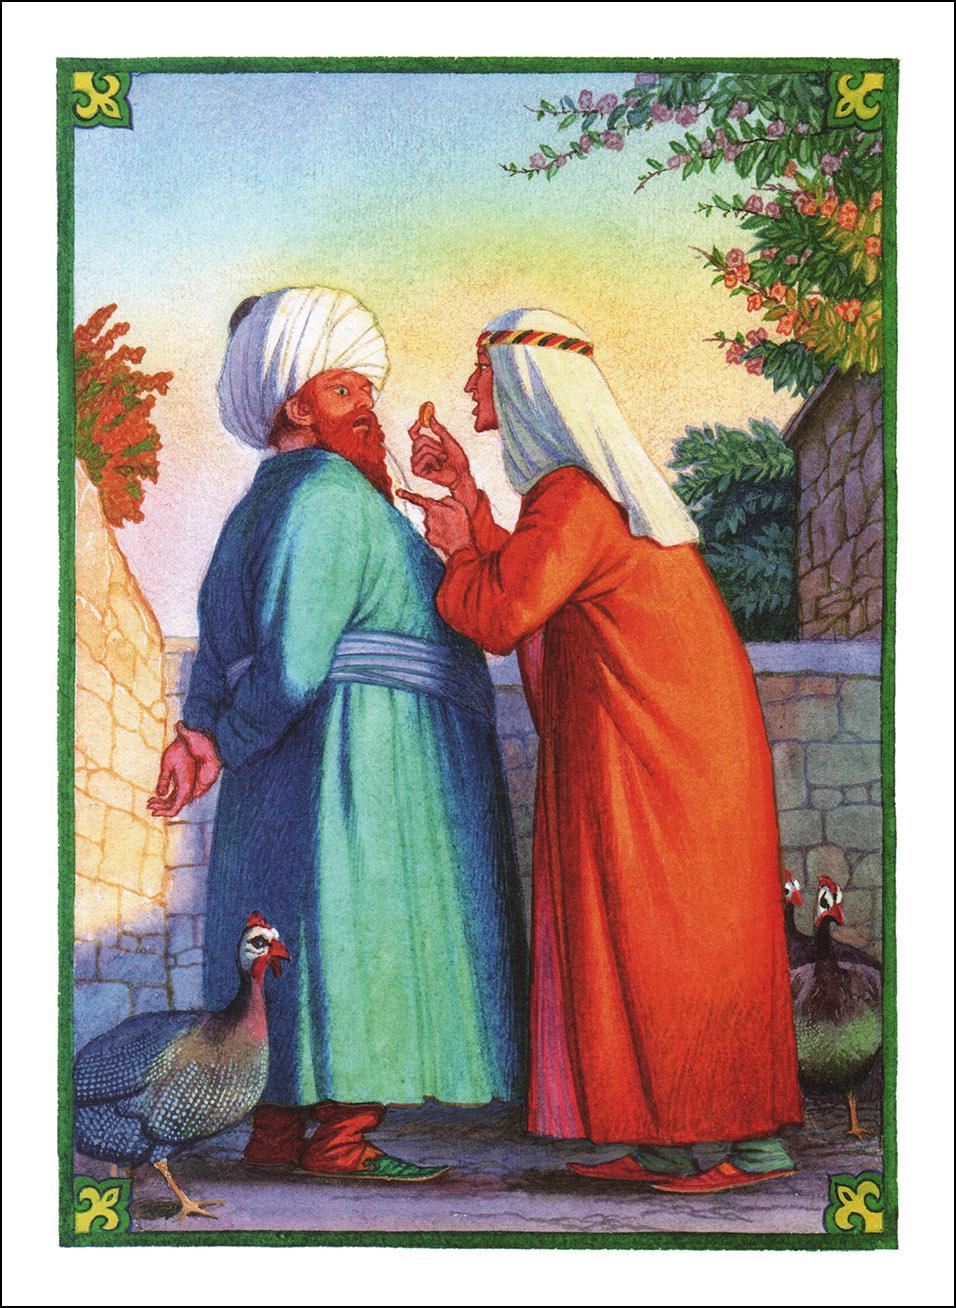 Виктор Бритвин, Али-Баба и сорок разбойников. Арабские сказки.